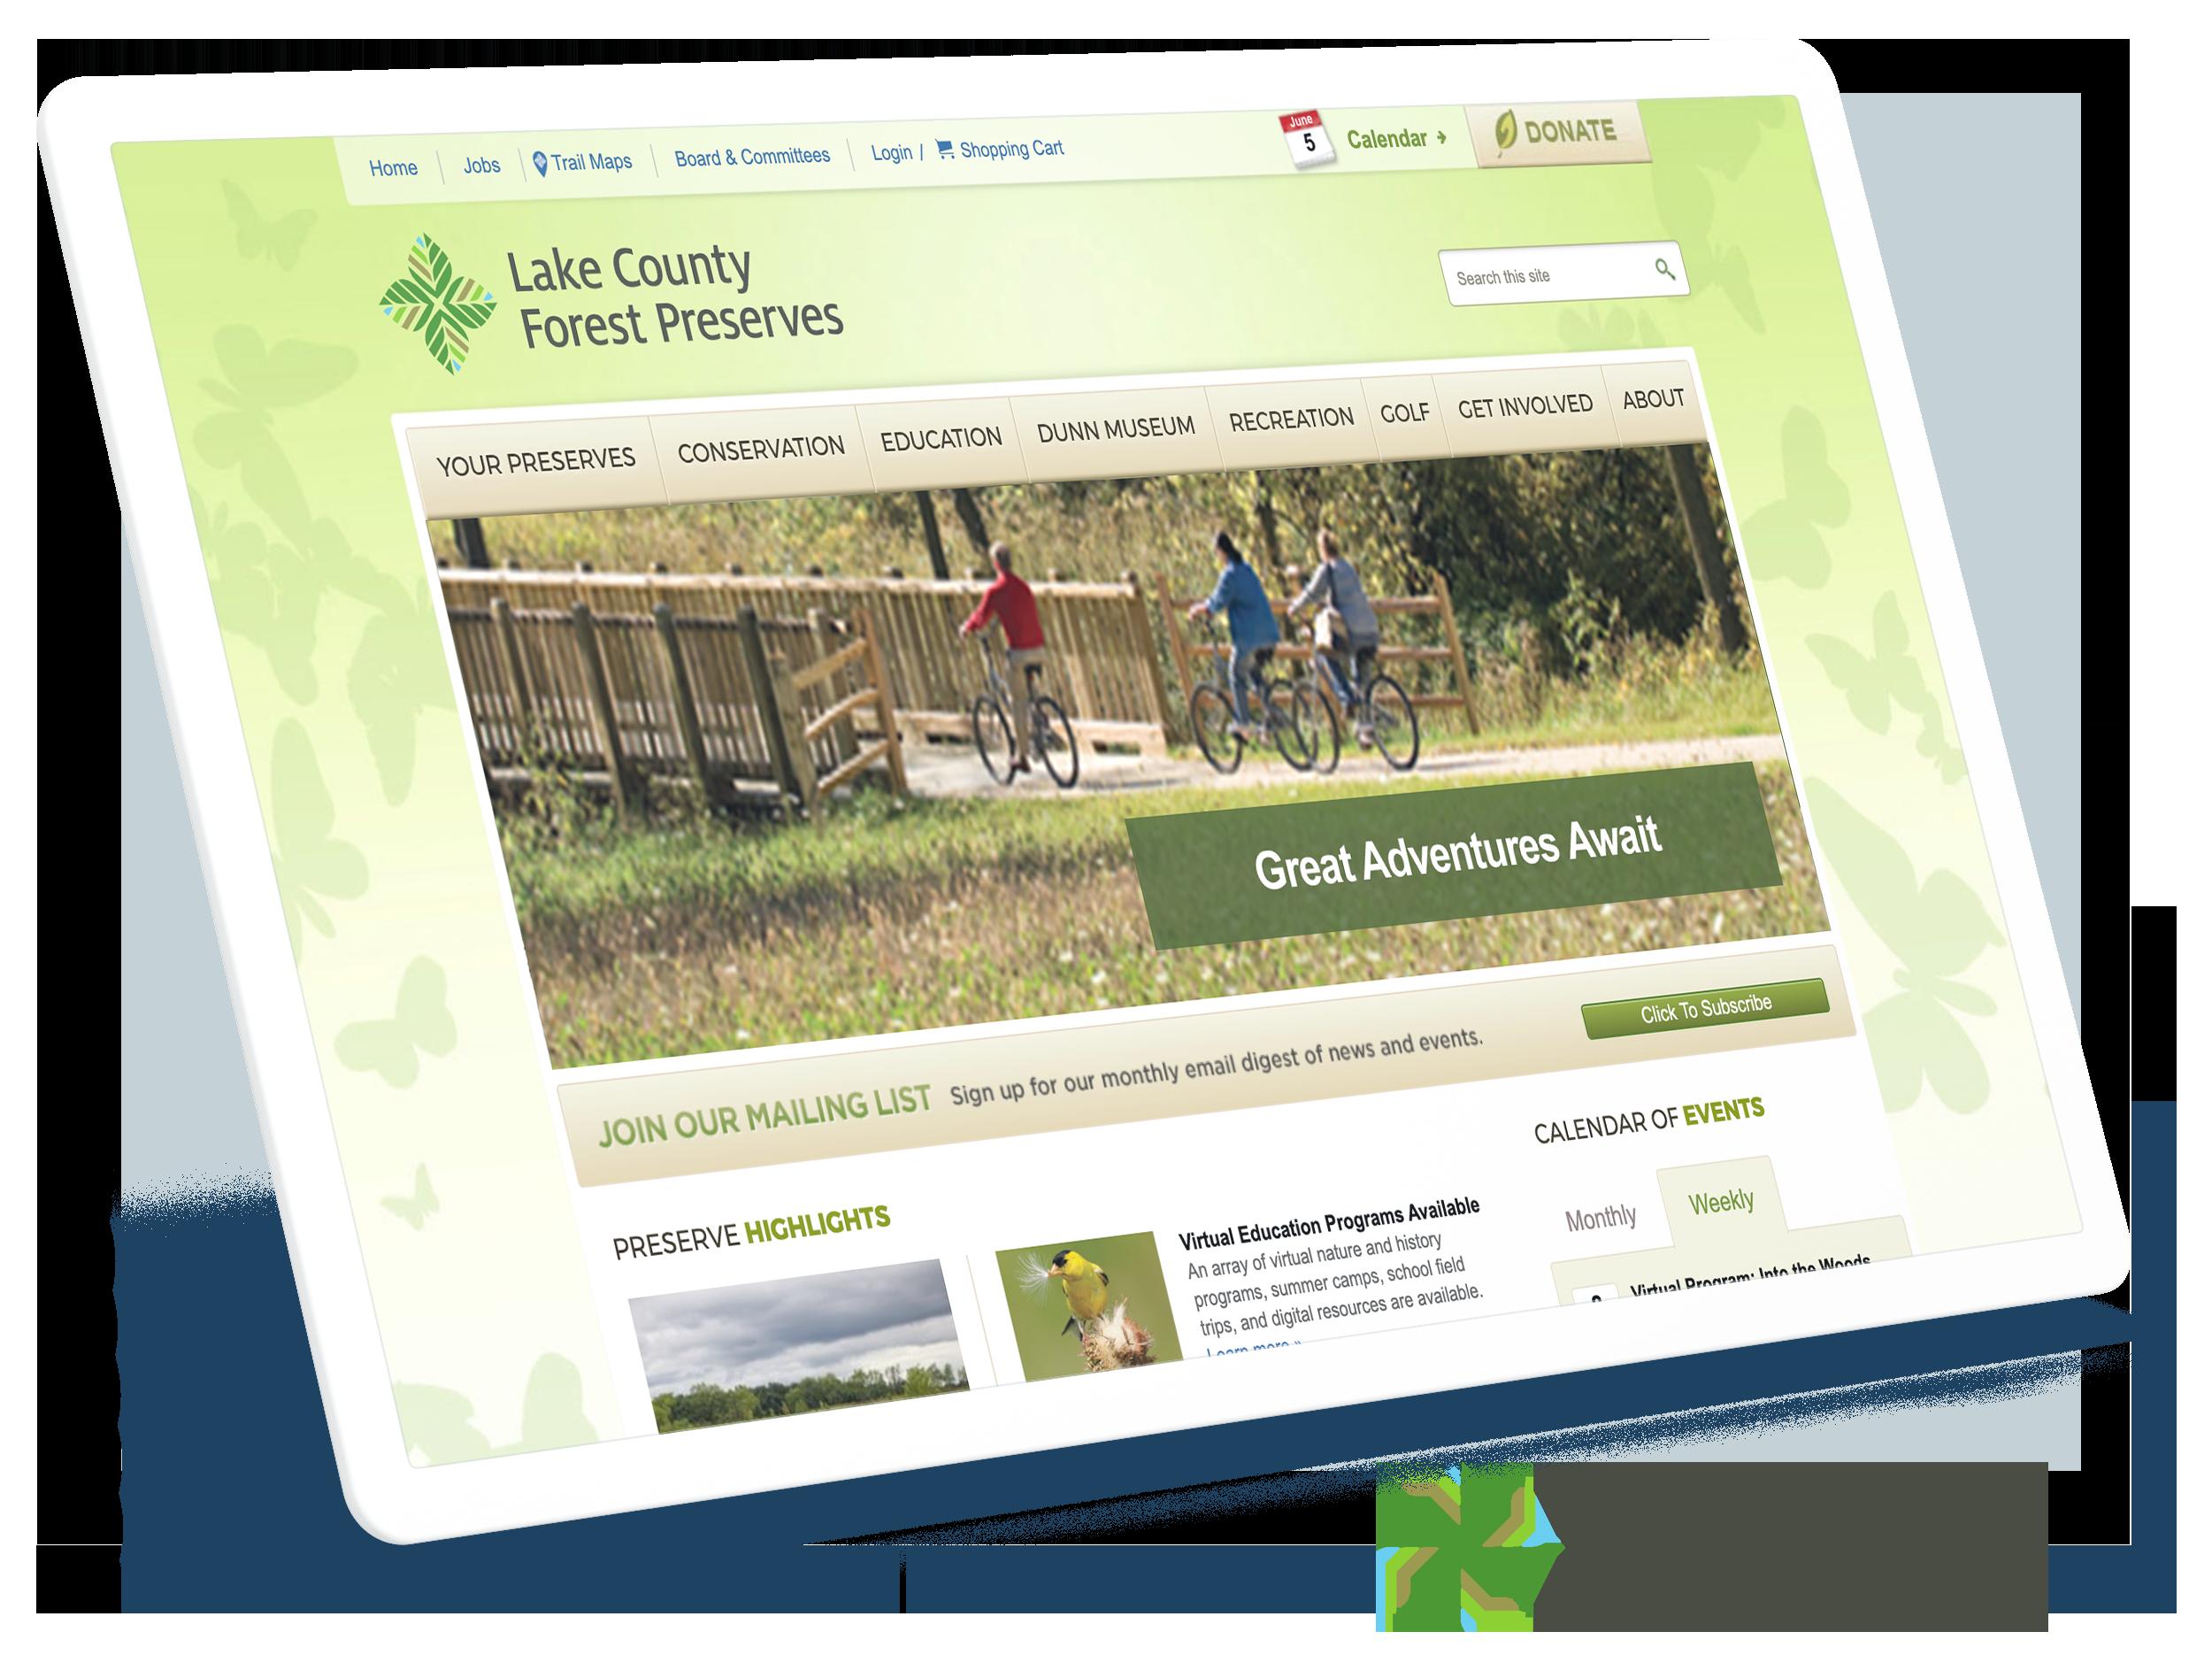 LakeCountyForestPreserves_Spotlight